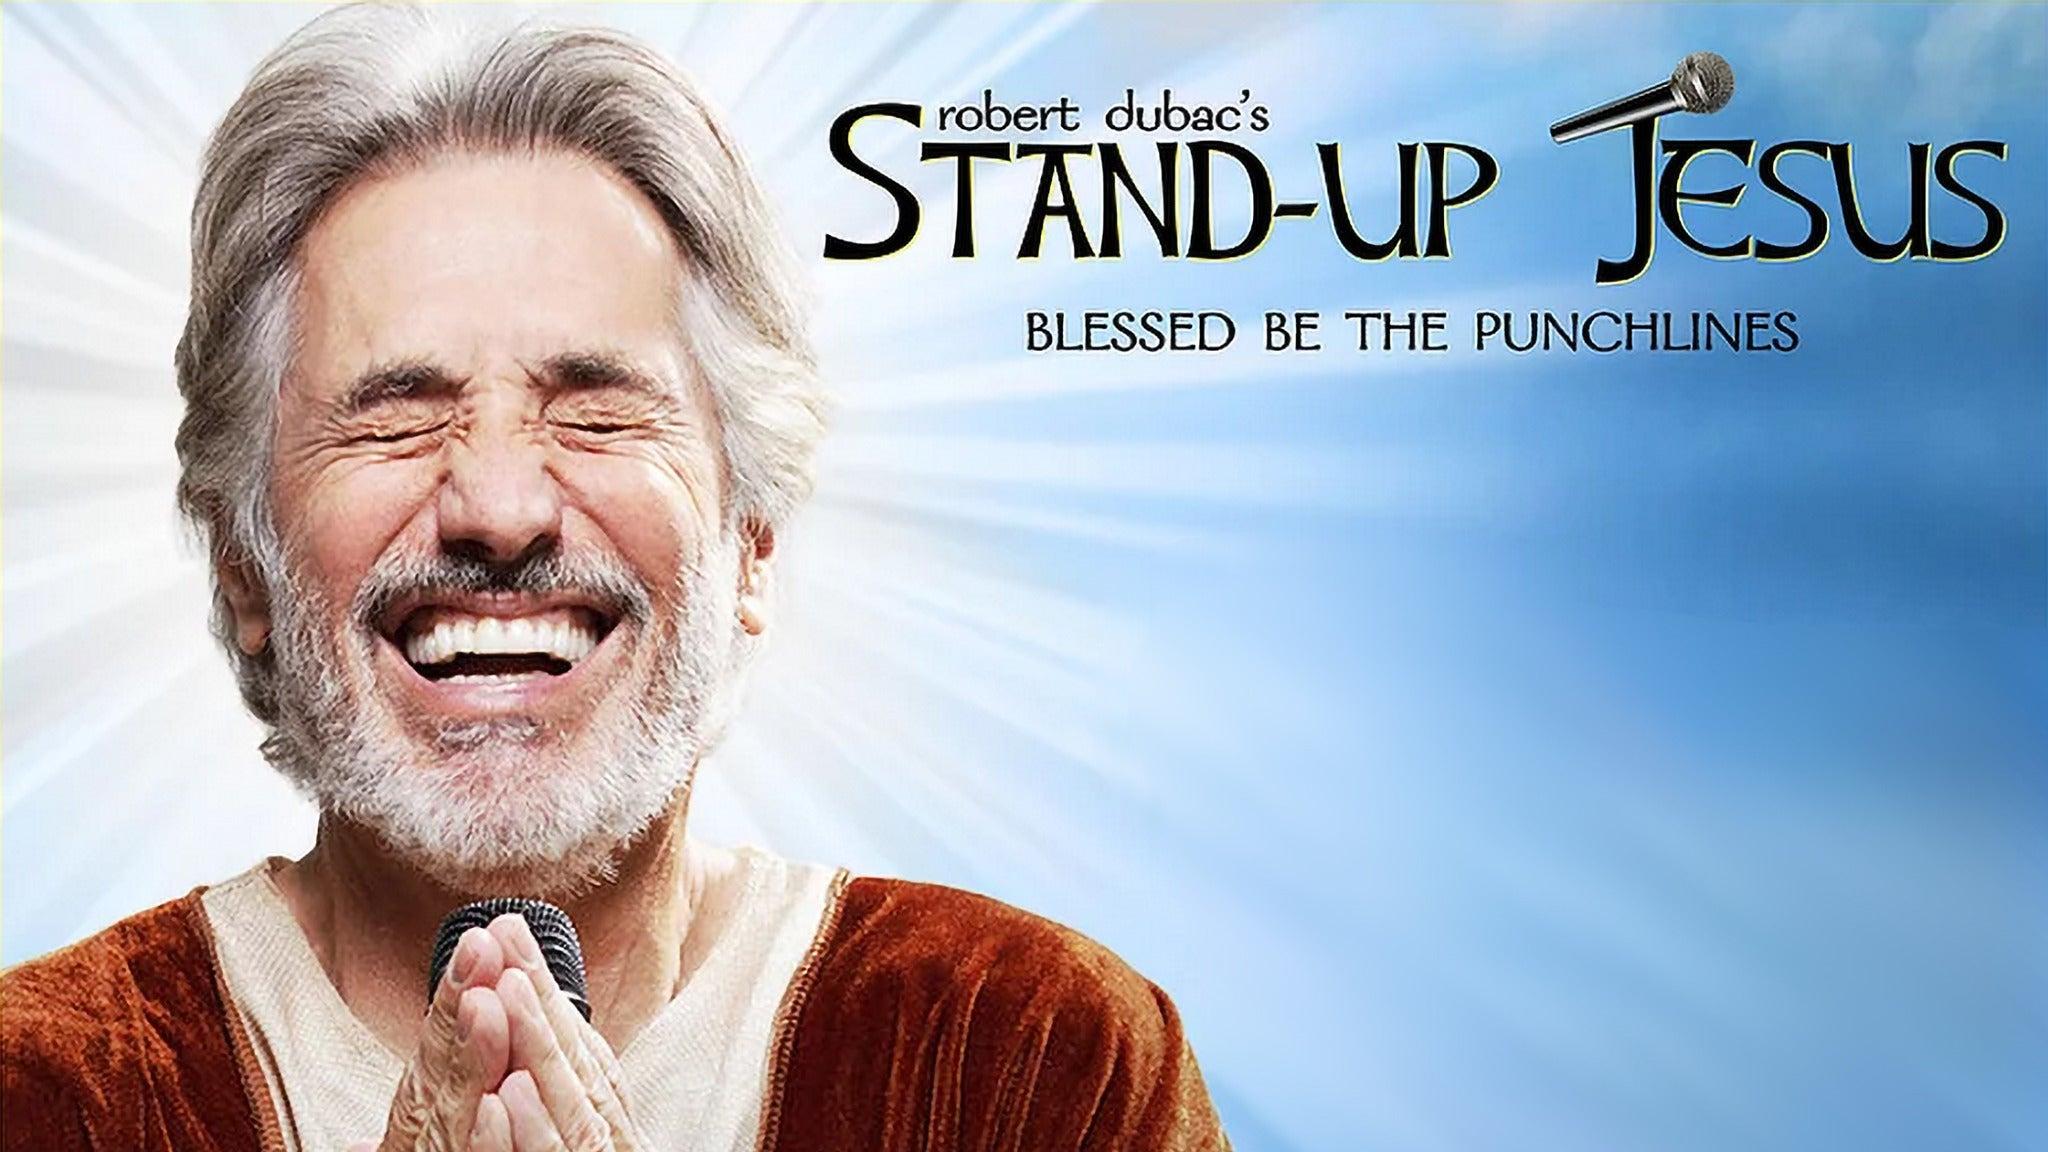 Robert Dubac's Stand-up Jesus